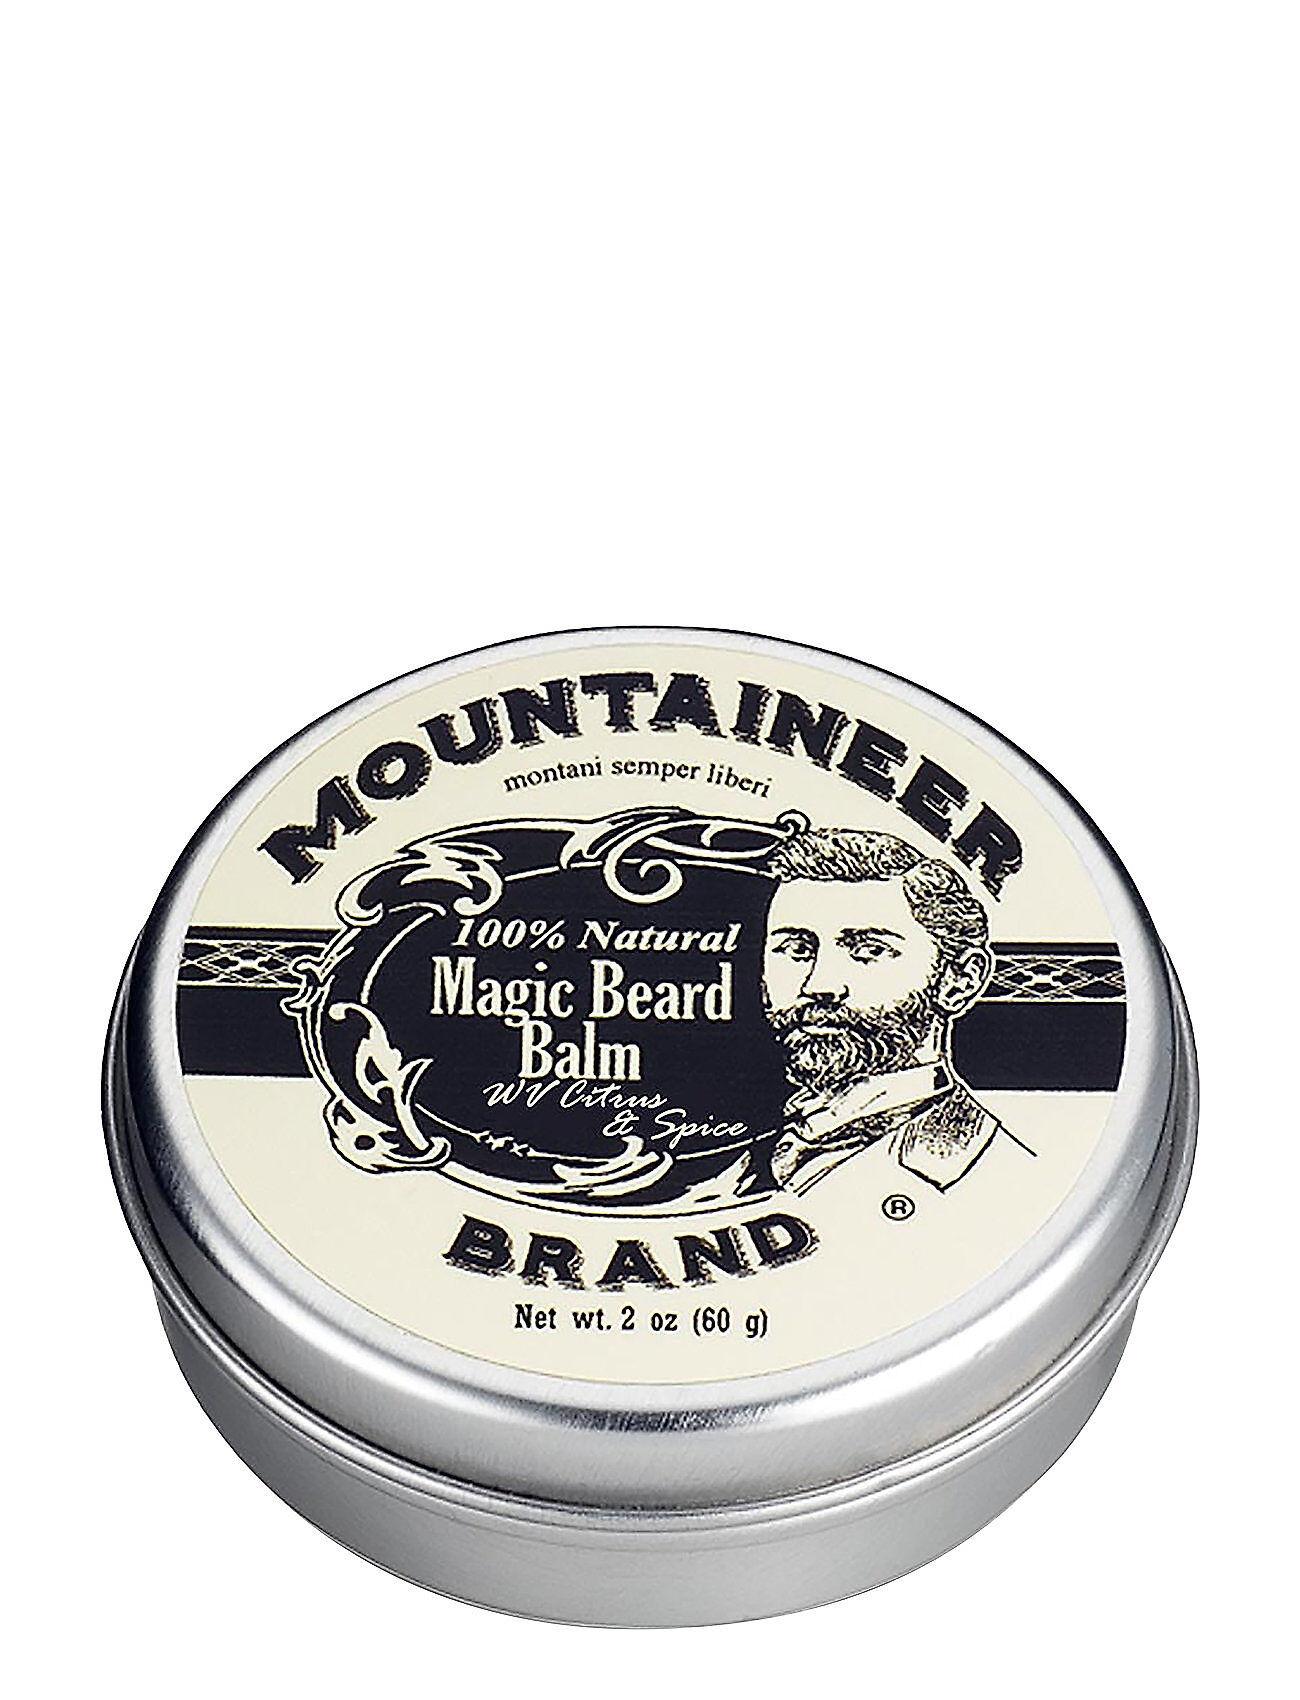 Mountaineer Brand Citrus & Spice Beard Balm Beauty MEN Shaving Products Beard & Mustache Nude Mountaineer Brand